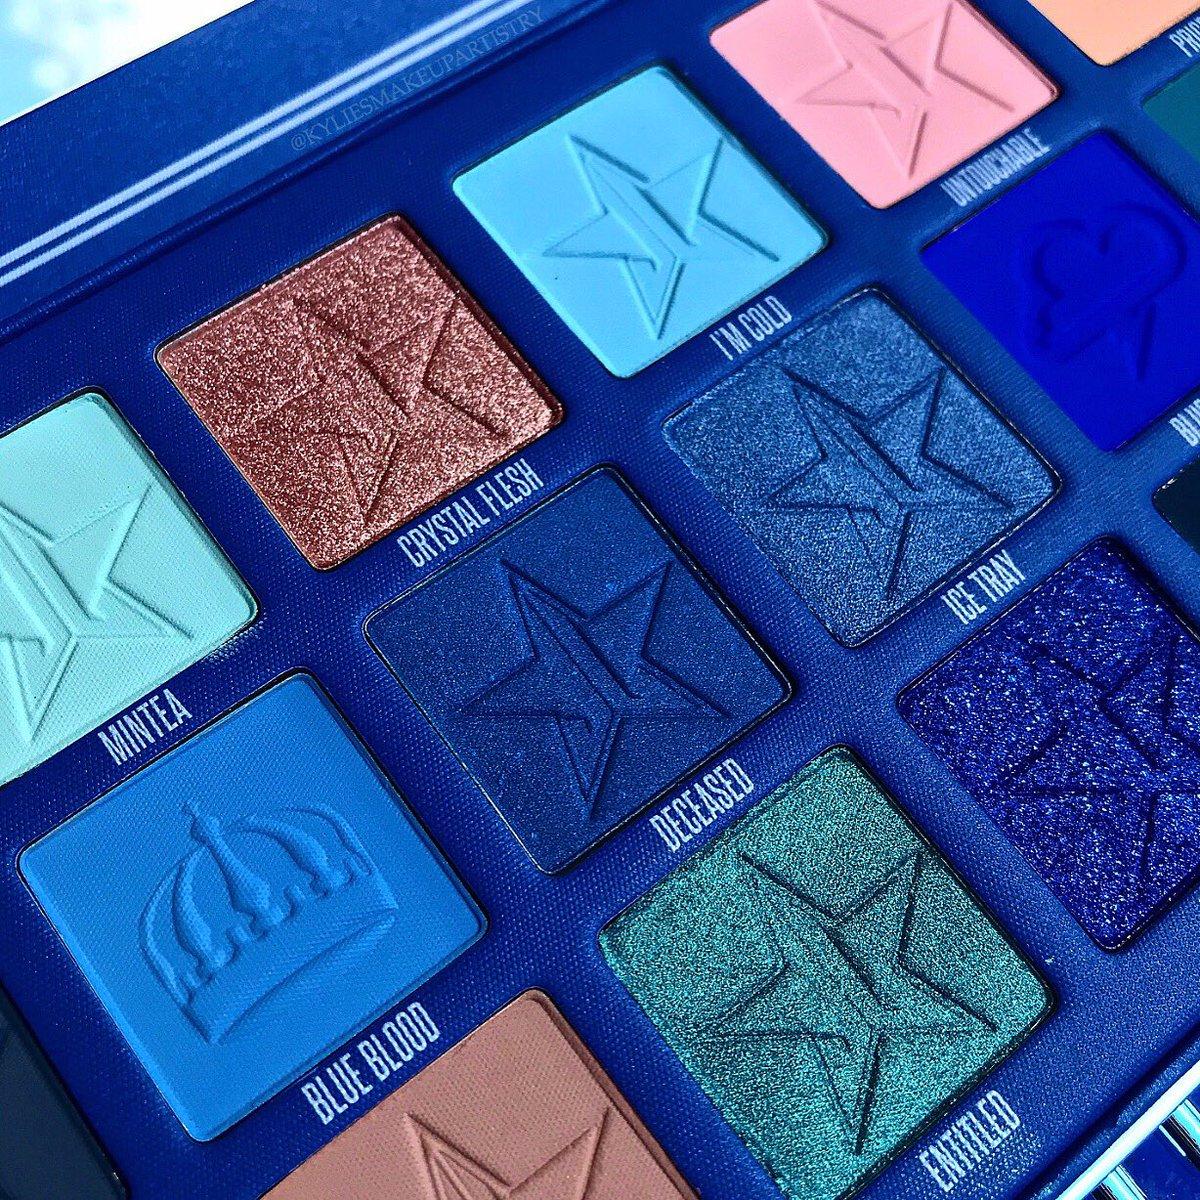 Such a beautiful palette  @JeffreeStar  #JeffreeStarCosmetics #BlueBlood <br>http://pic.twitter.com/DZYRMyLyOS